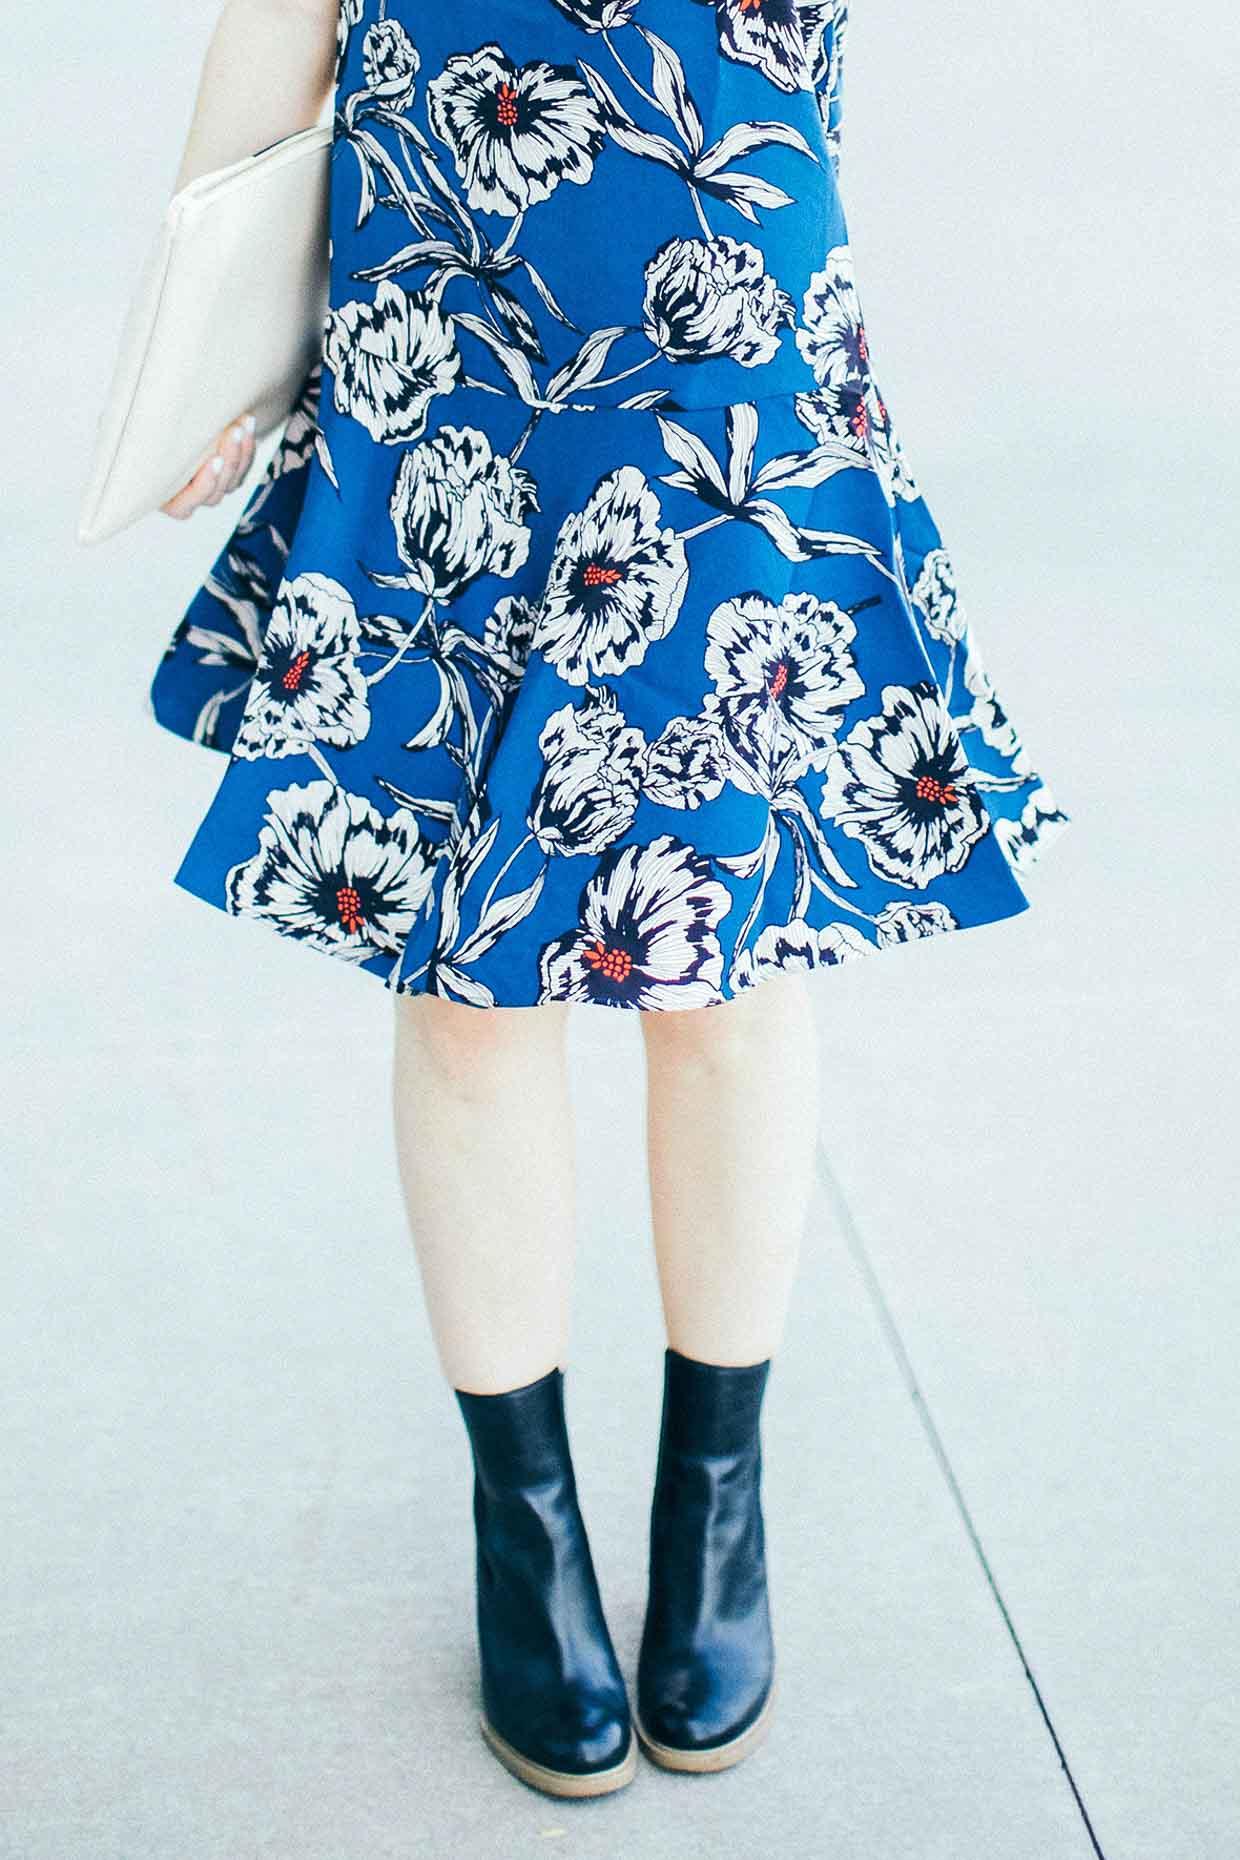 Poor Little It Girl - Black Booties and Blue Florals - @poorlilitgirl